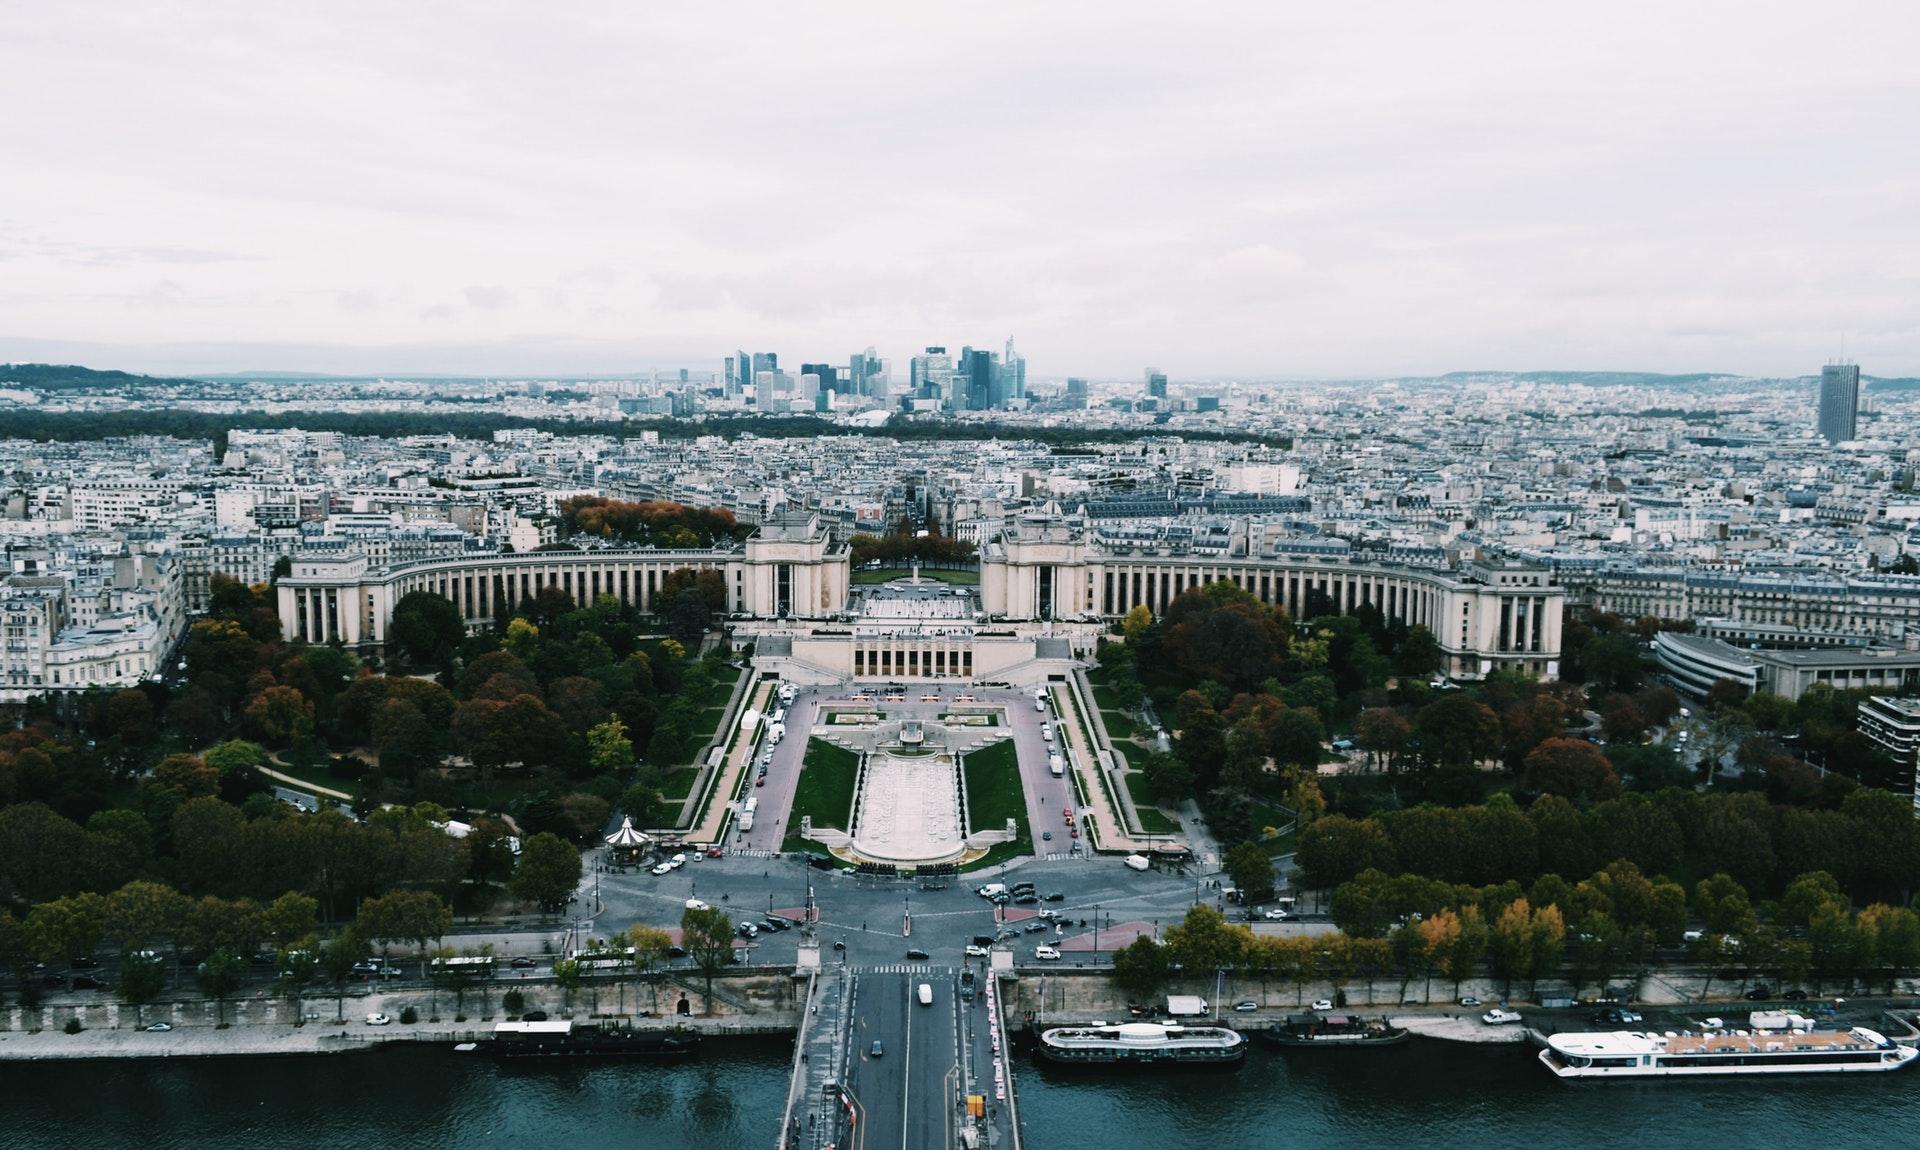 Best Views of Eiffel Tower